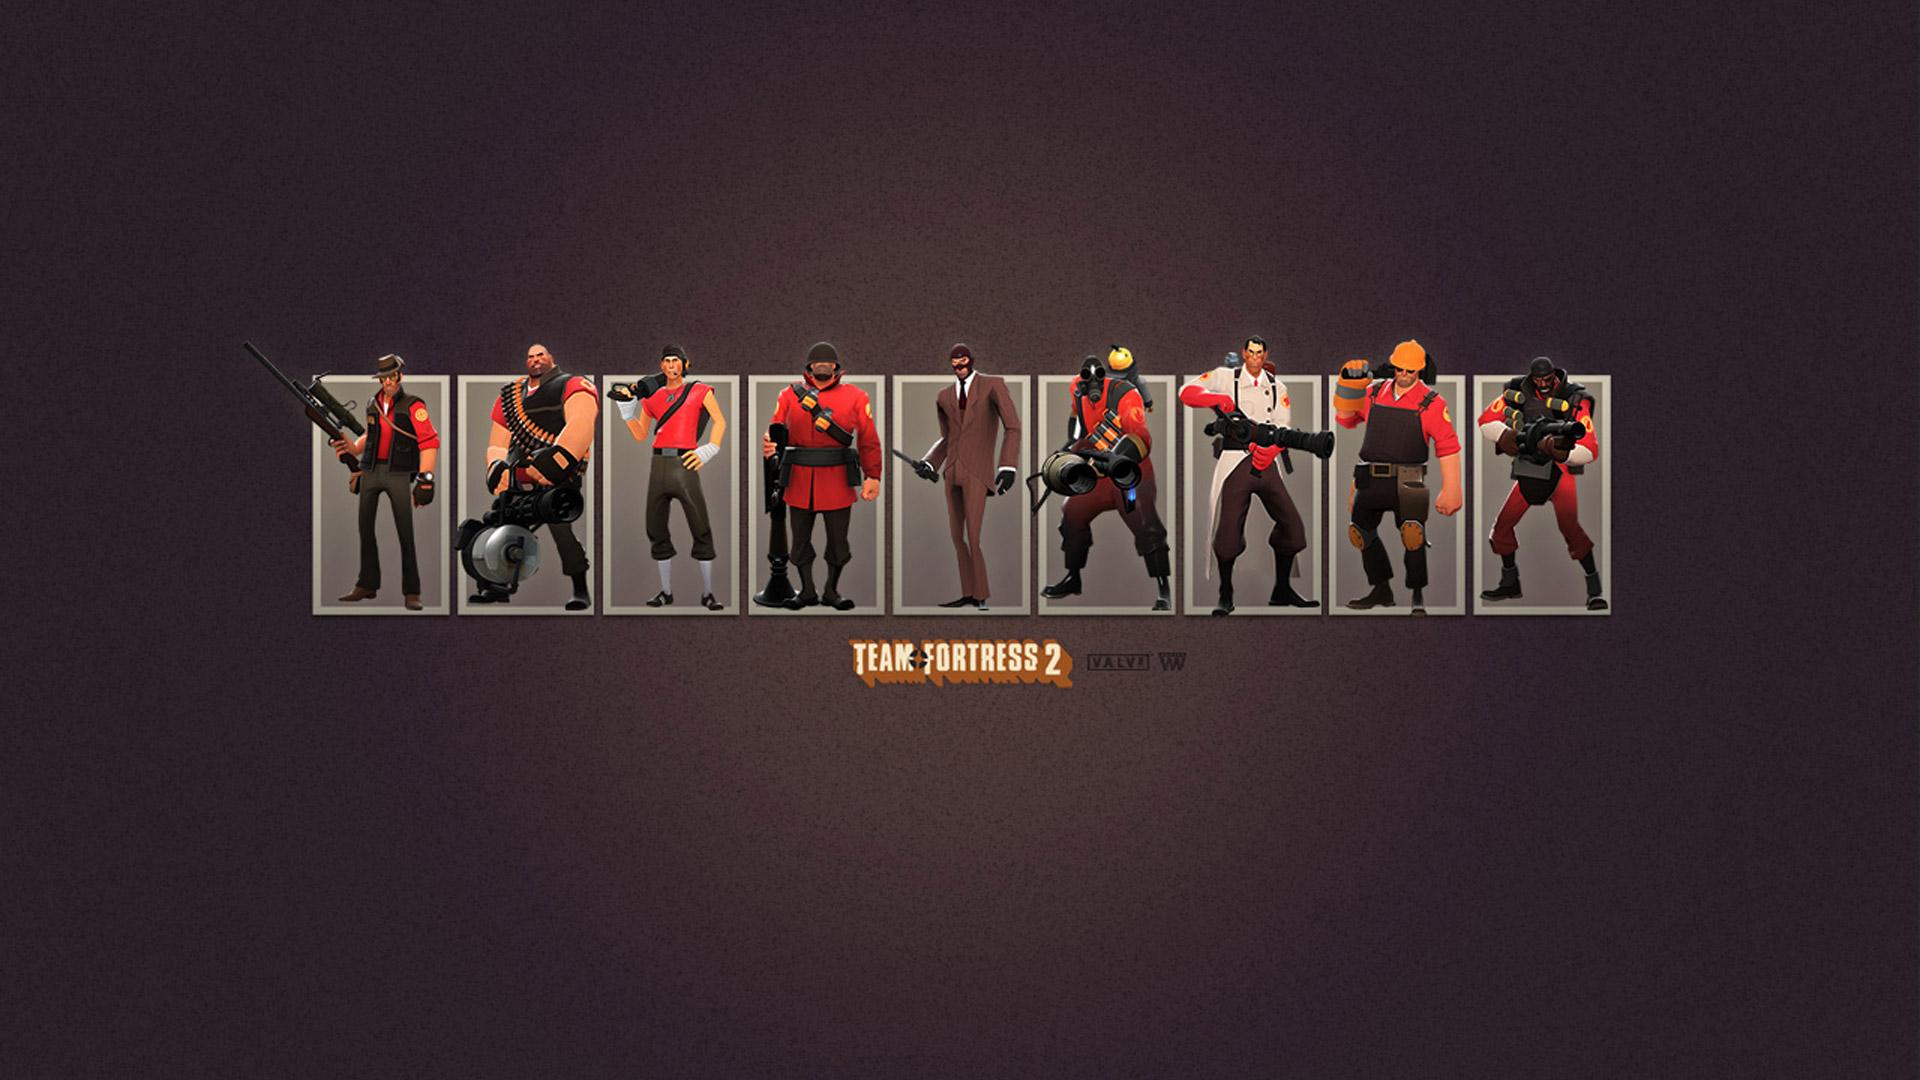 Team Fortress 2 Wallpaper in 1920x1080